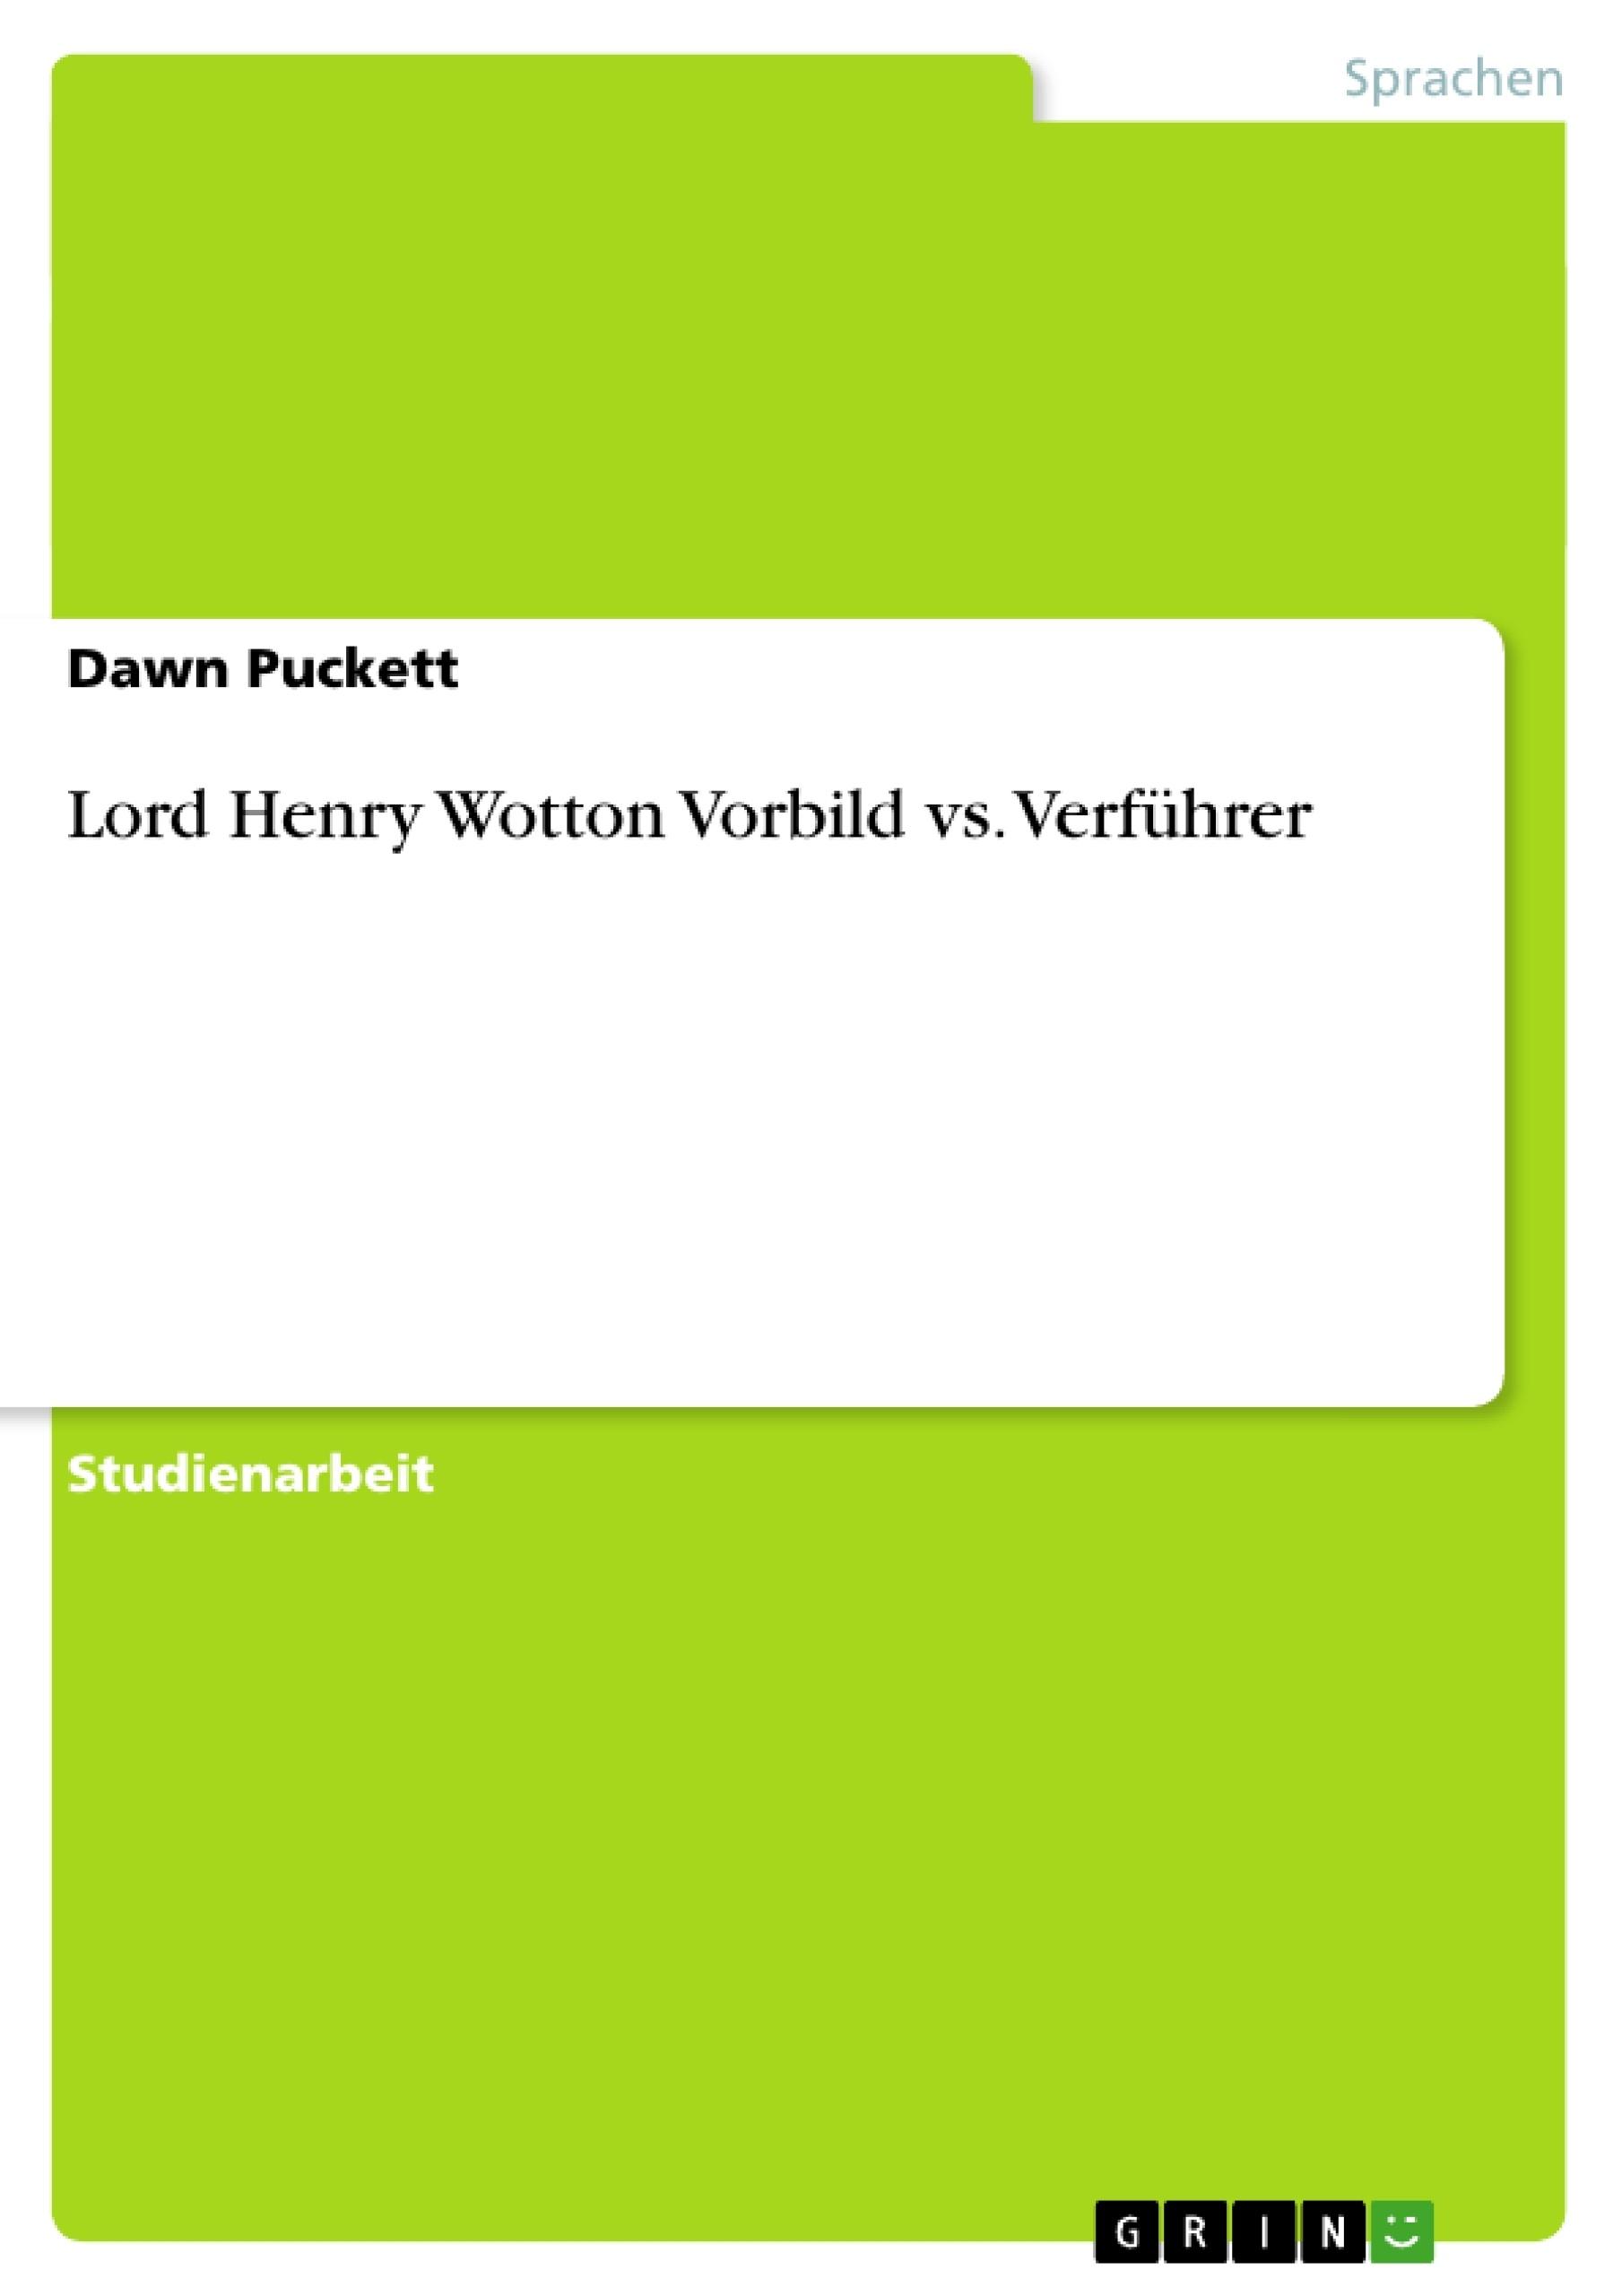 Titel: Lord Henry Wotton Vorbild vs. Verführer